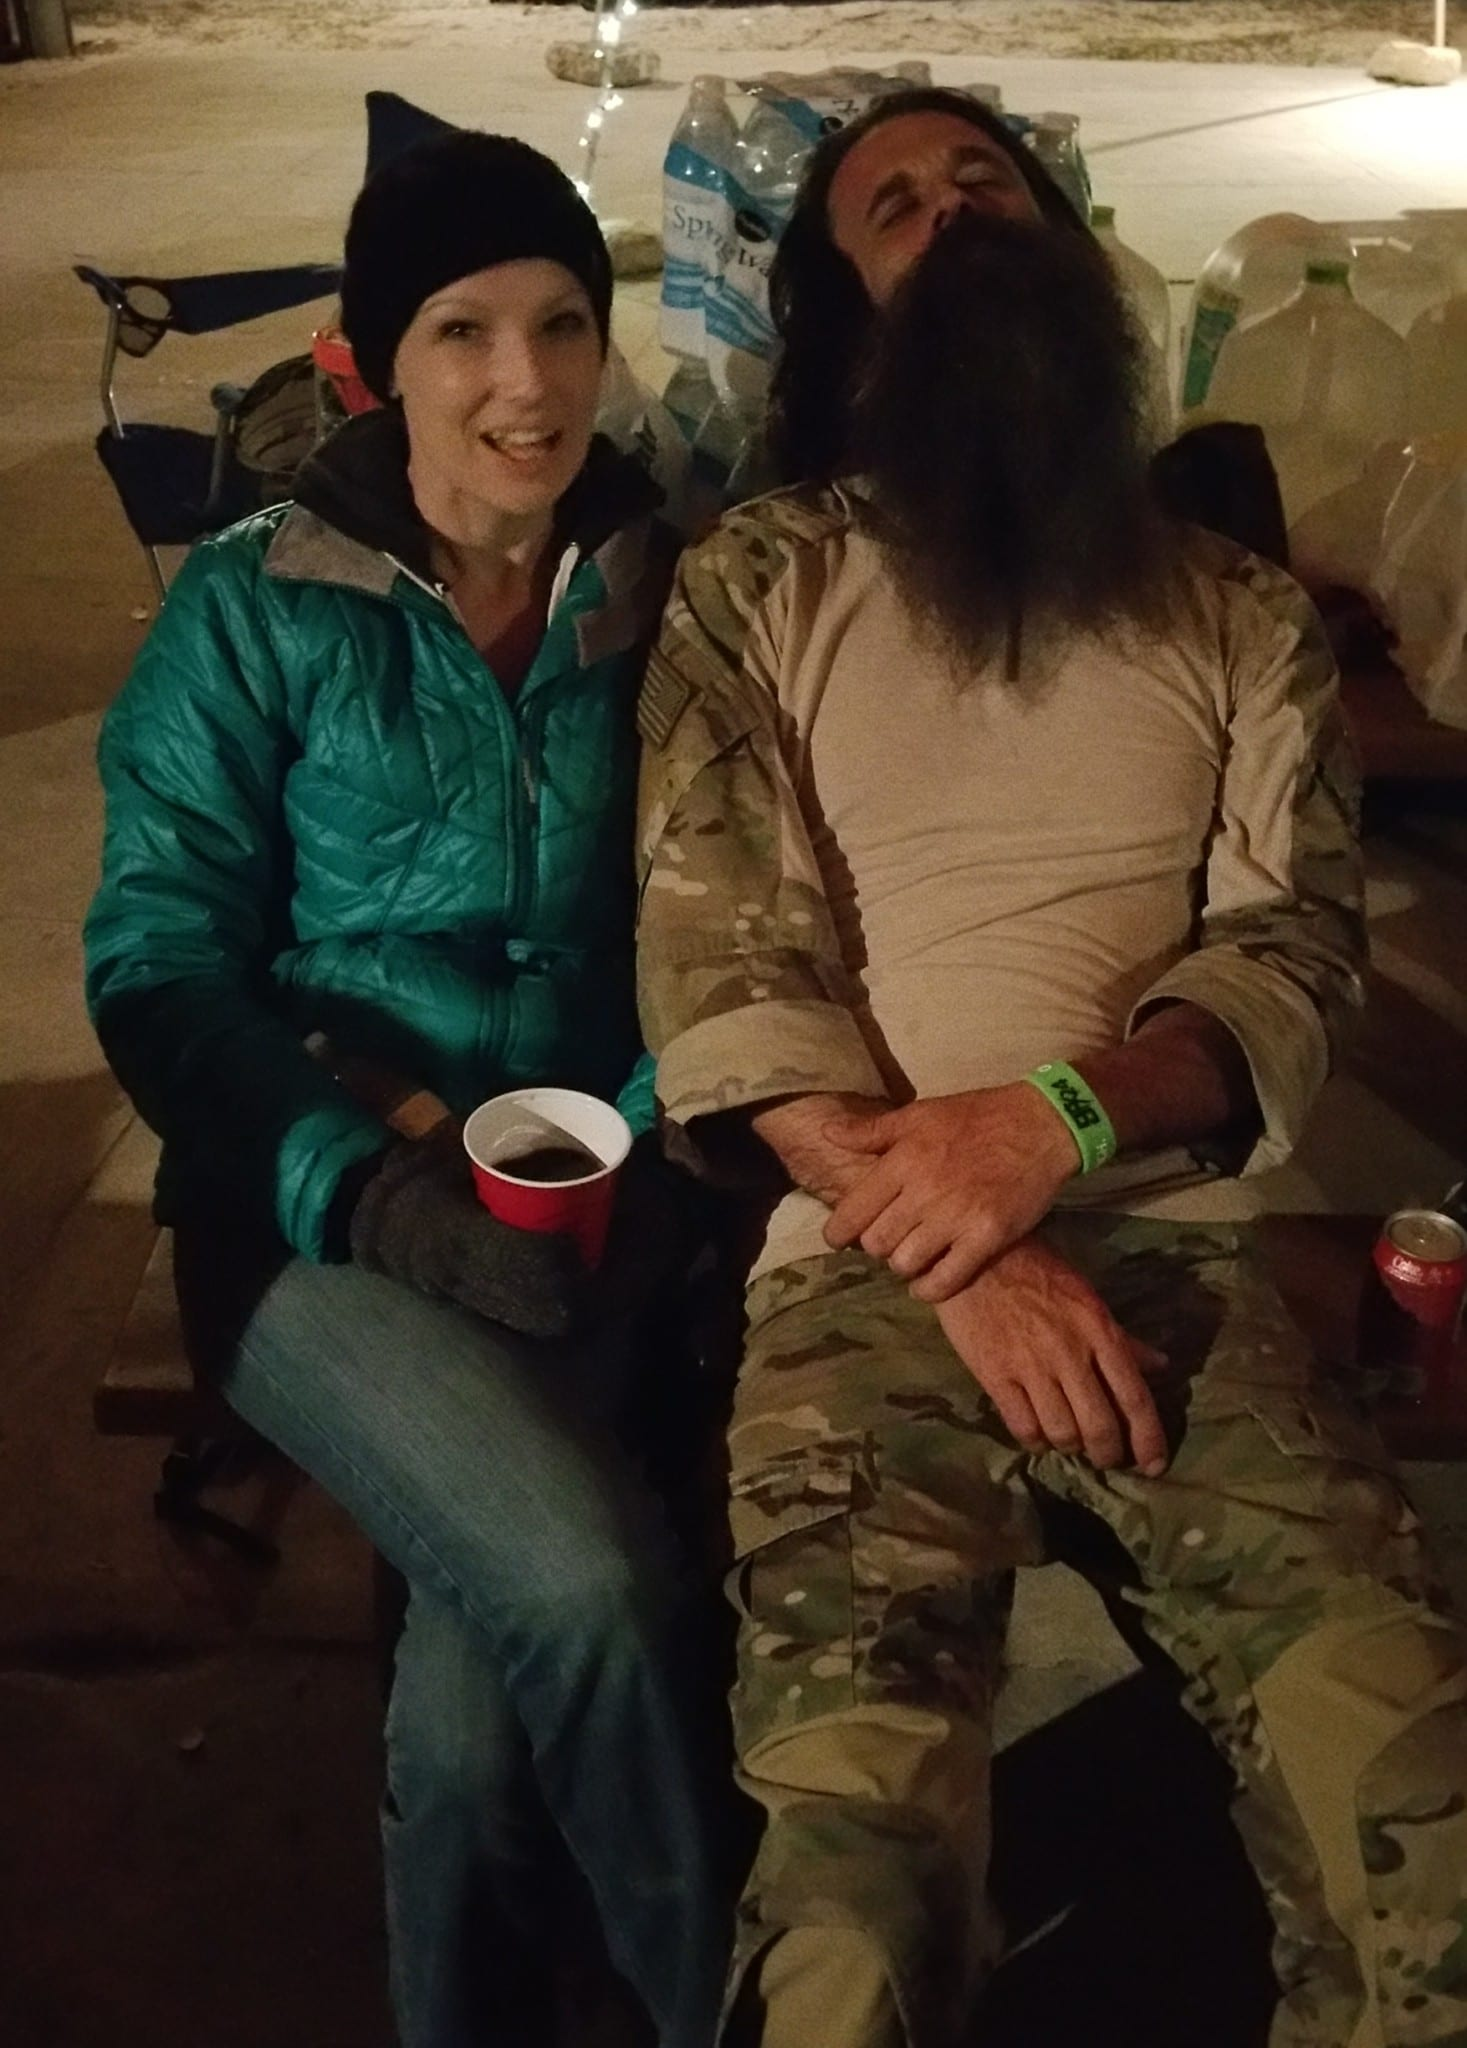 BattleFrog 24hr - Tired Beard